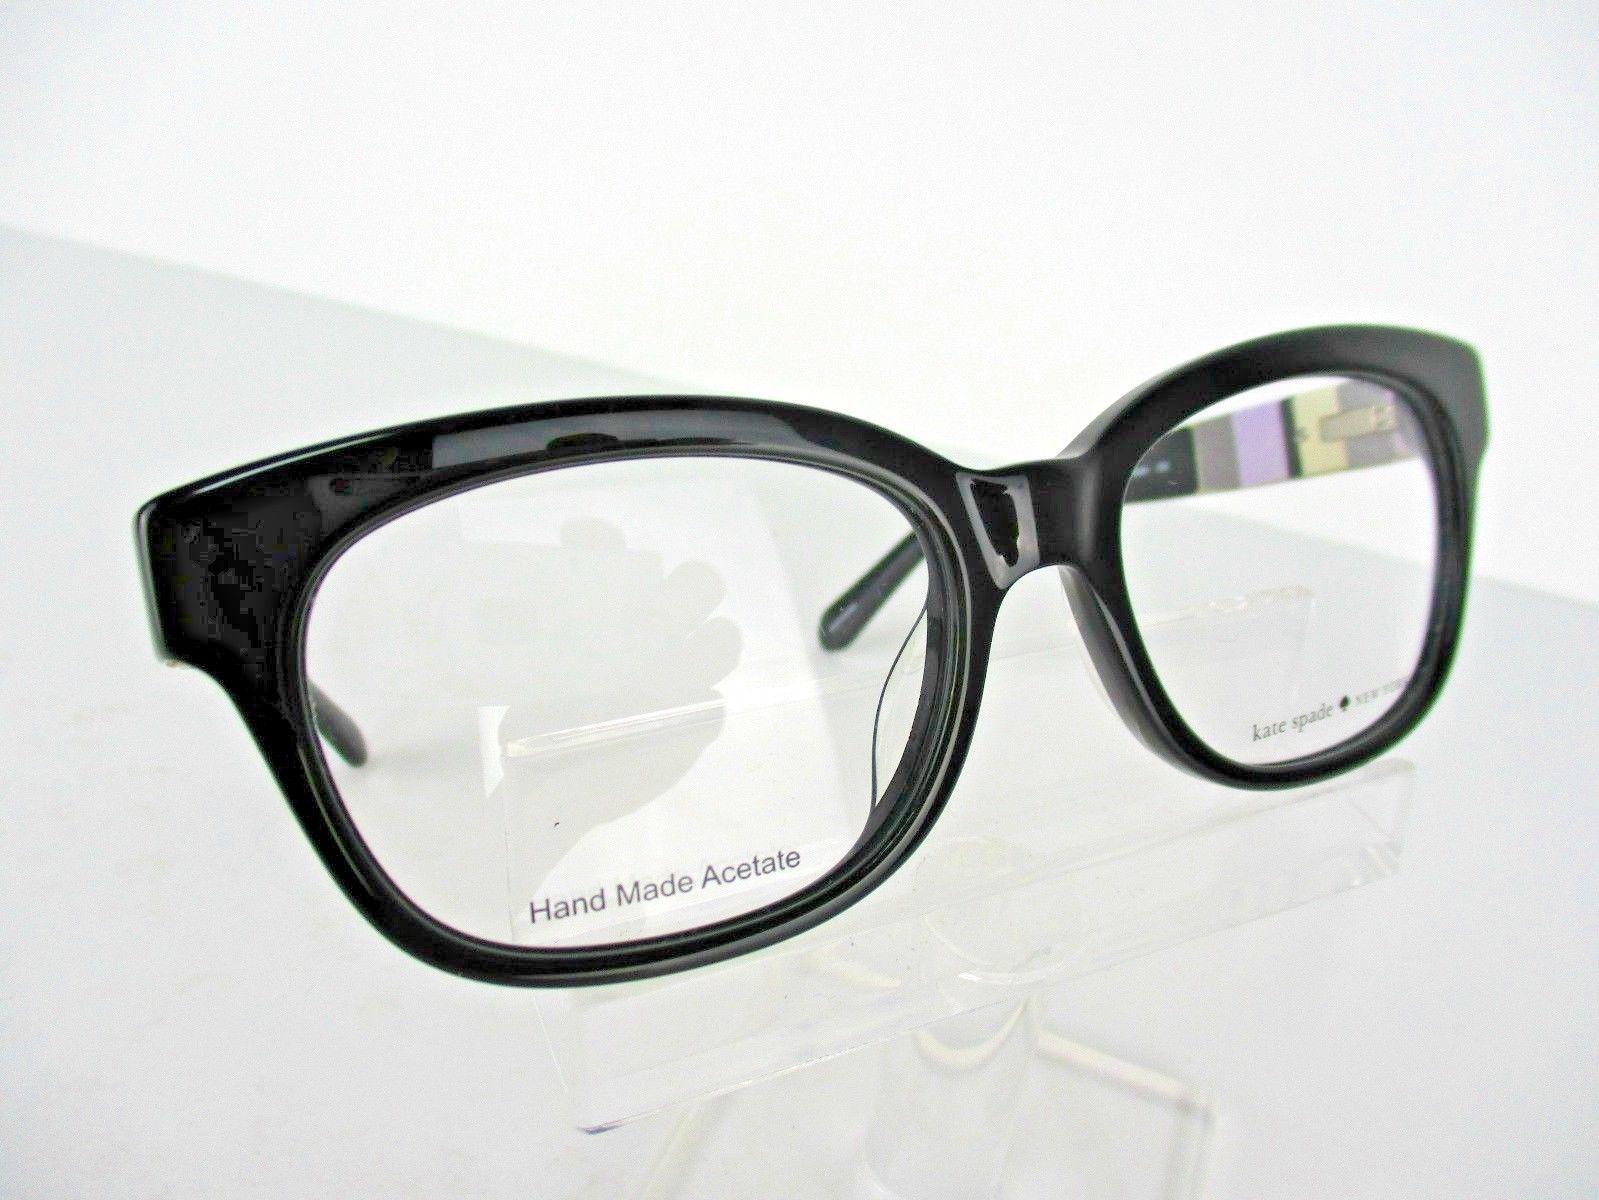 3554ec51fc Kate Spade Andra   F (W91) Black 52 x 16 135 and 39 similar items. 57